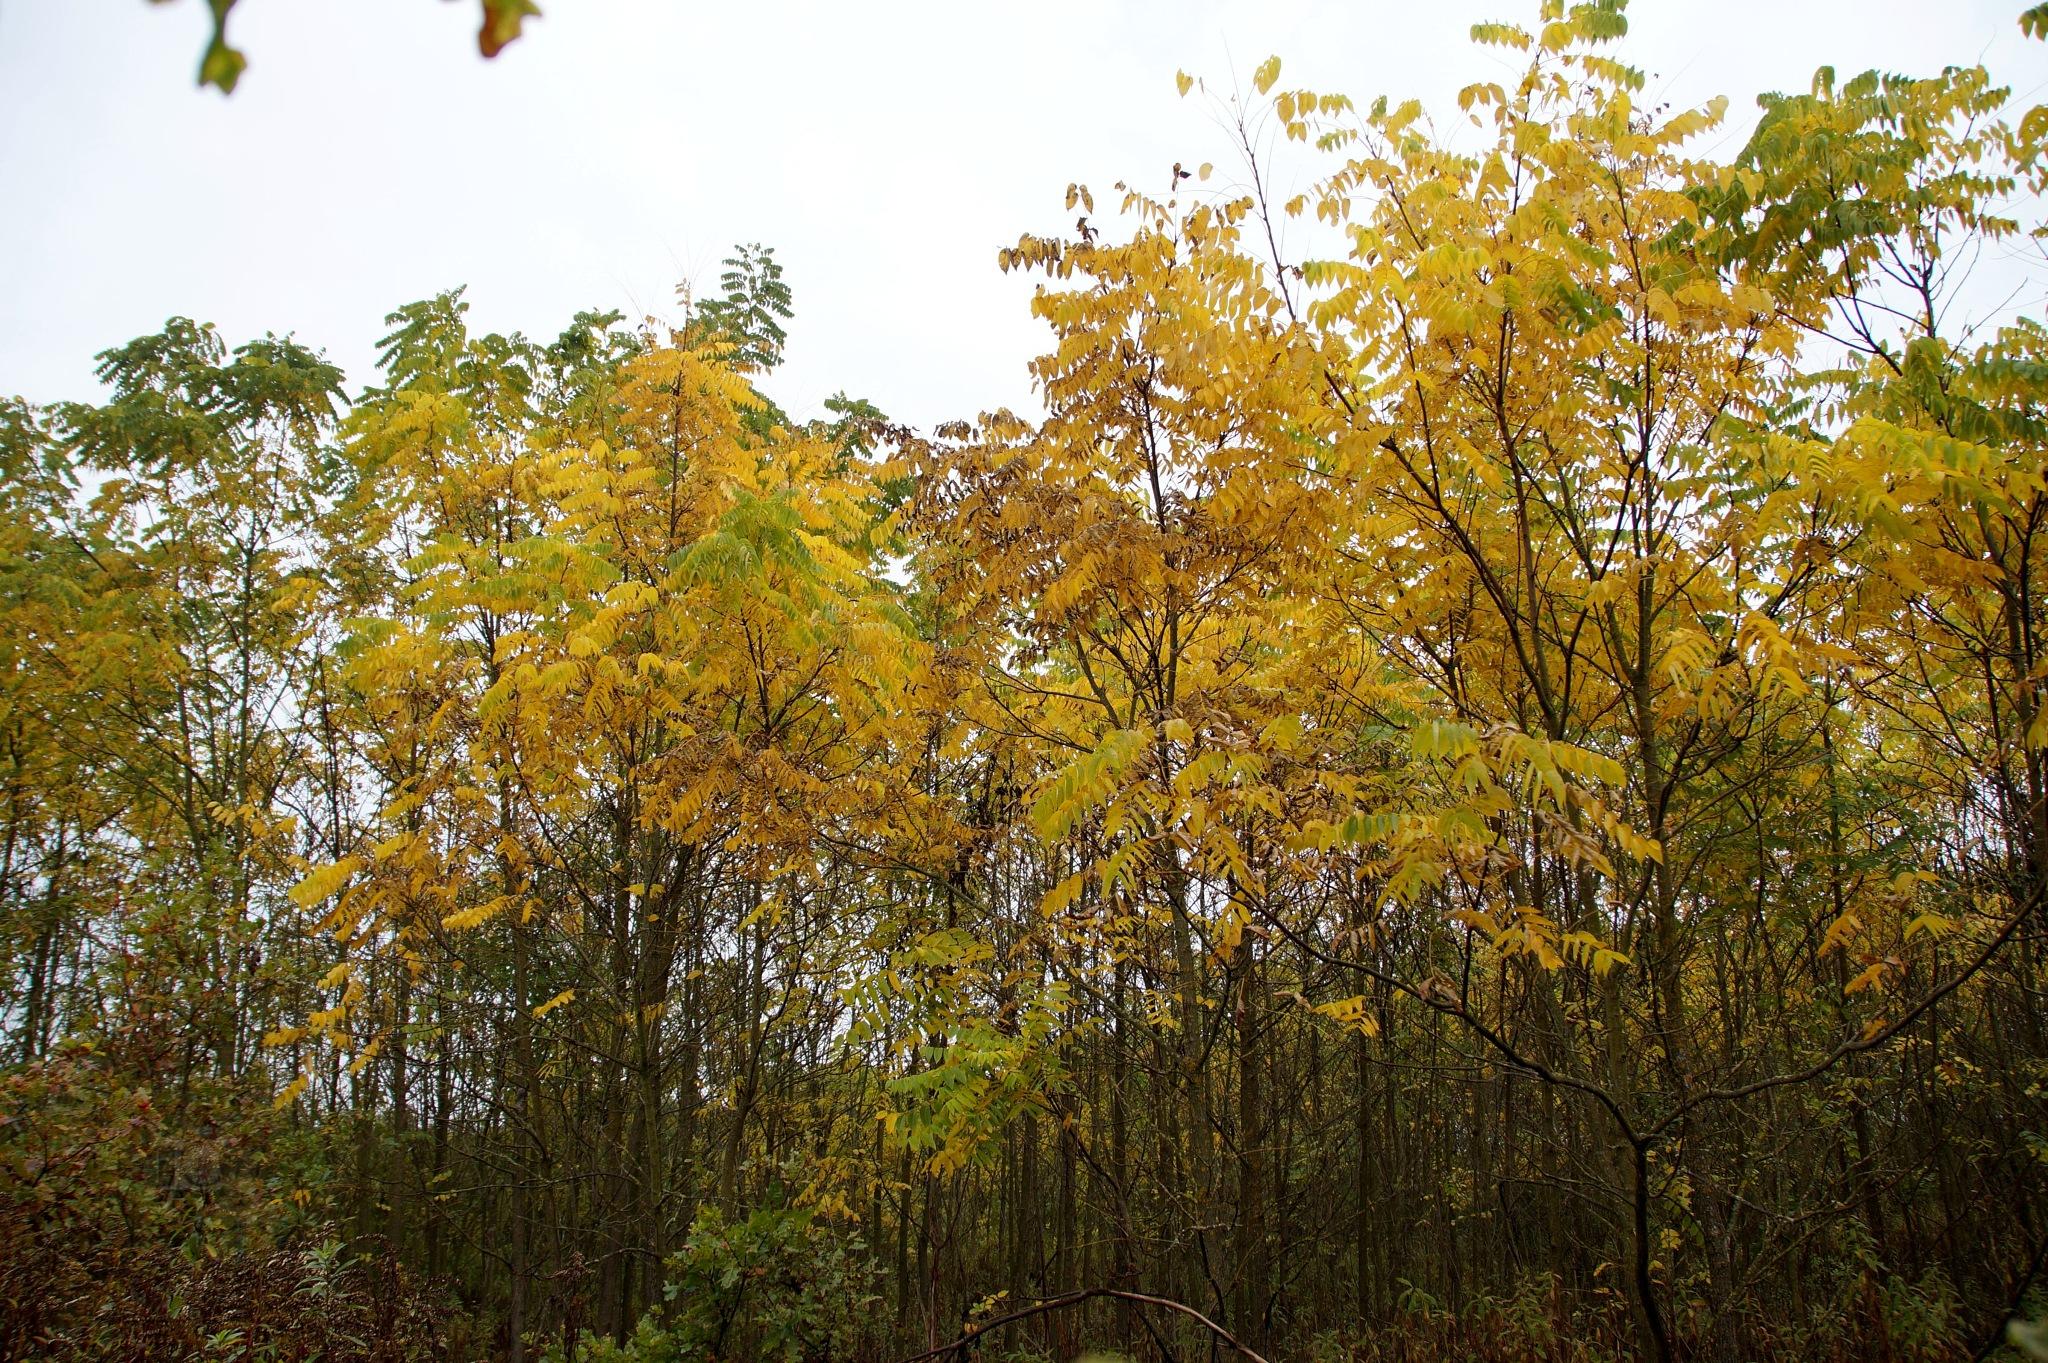 Oct.10, autumn forest by hunyadigeza